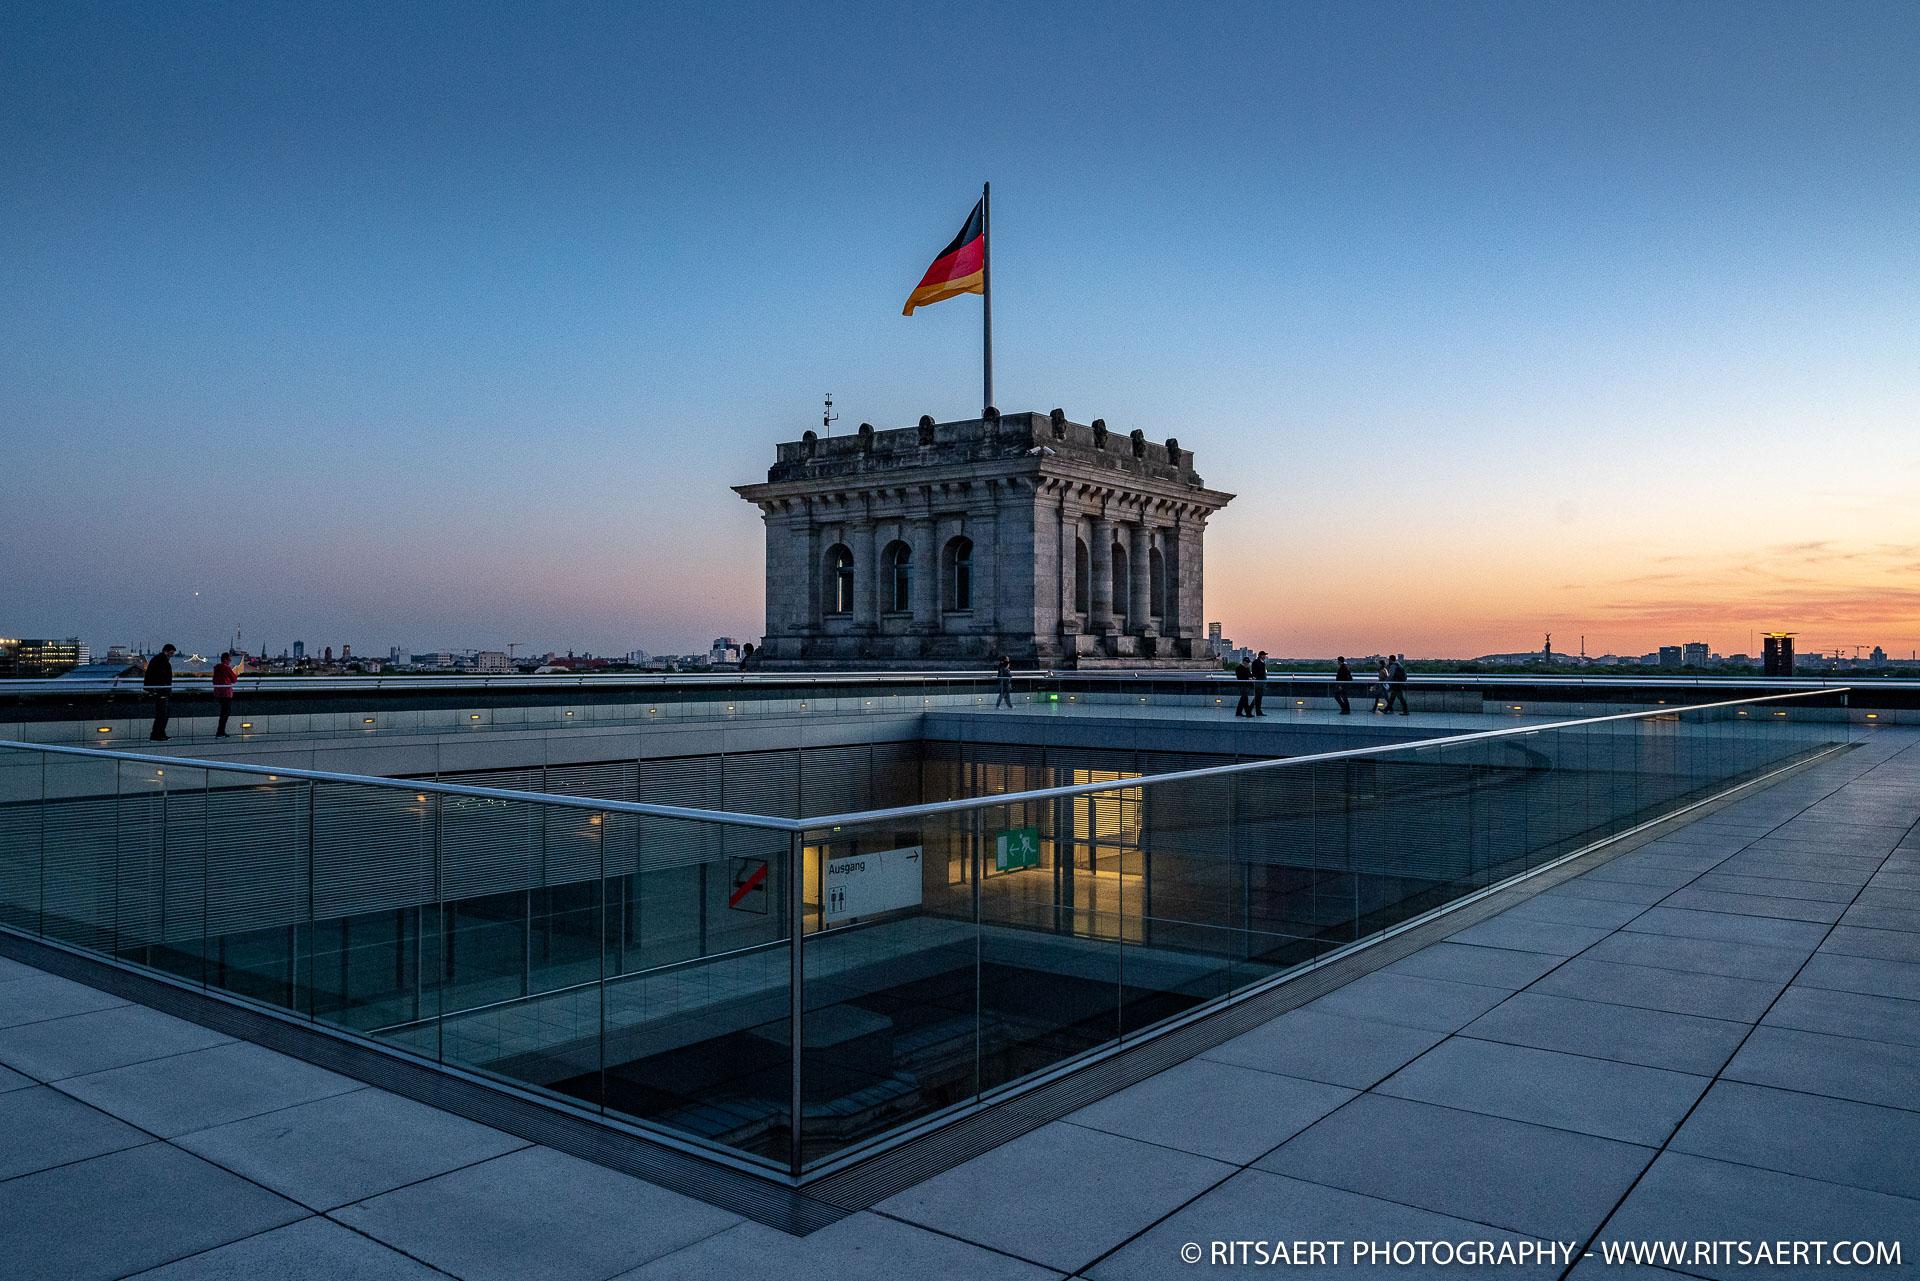 Roof top - Reichstag - Berlin - Germany